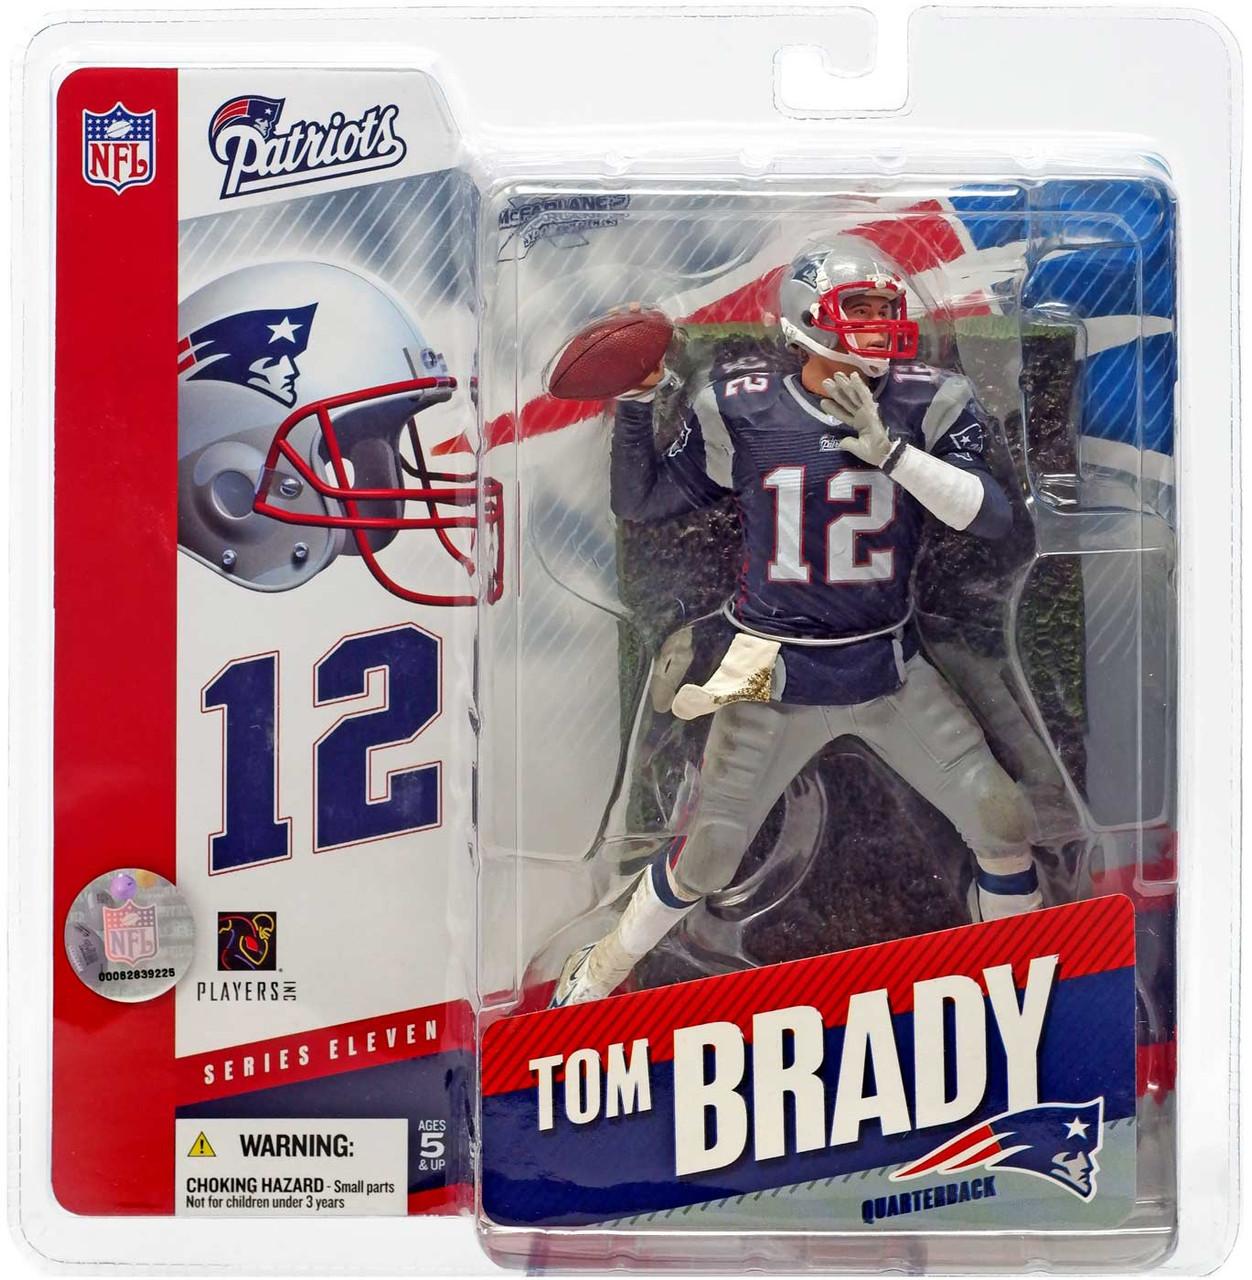 34f0abd1 McFarlane Toys NFL New England Patriots Sports Picks Series 11 Tom Brady  Action Figure [Blue